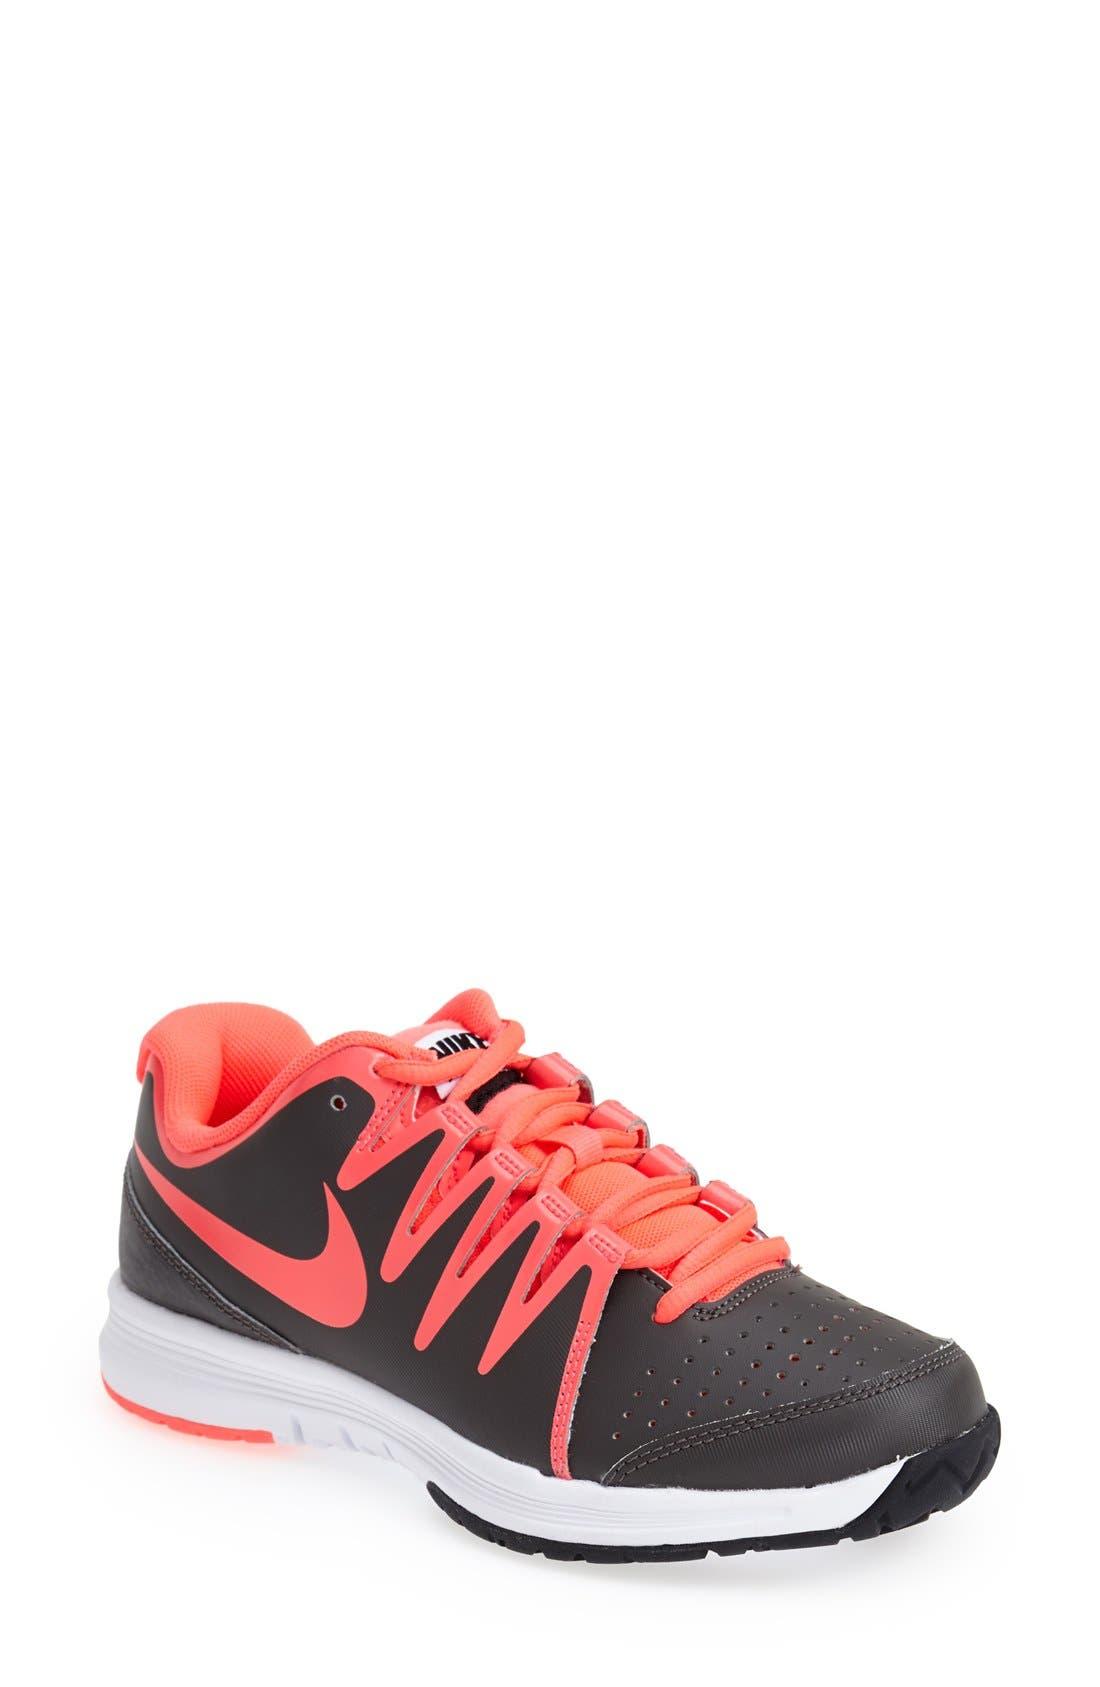 Alternate Image 1 Selected - Nike 'Vapor Court' Tennis Shoe (Women)